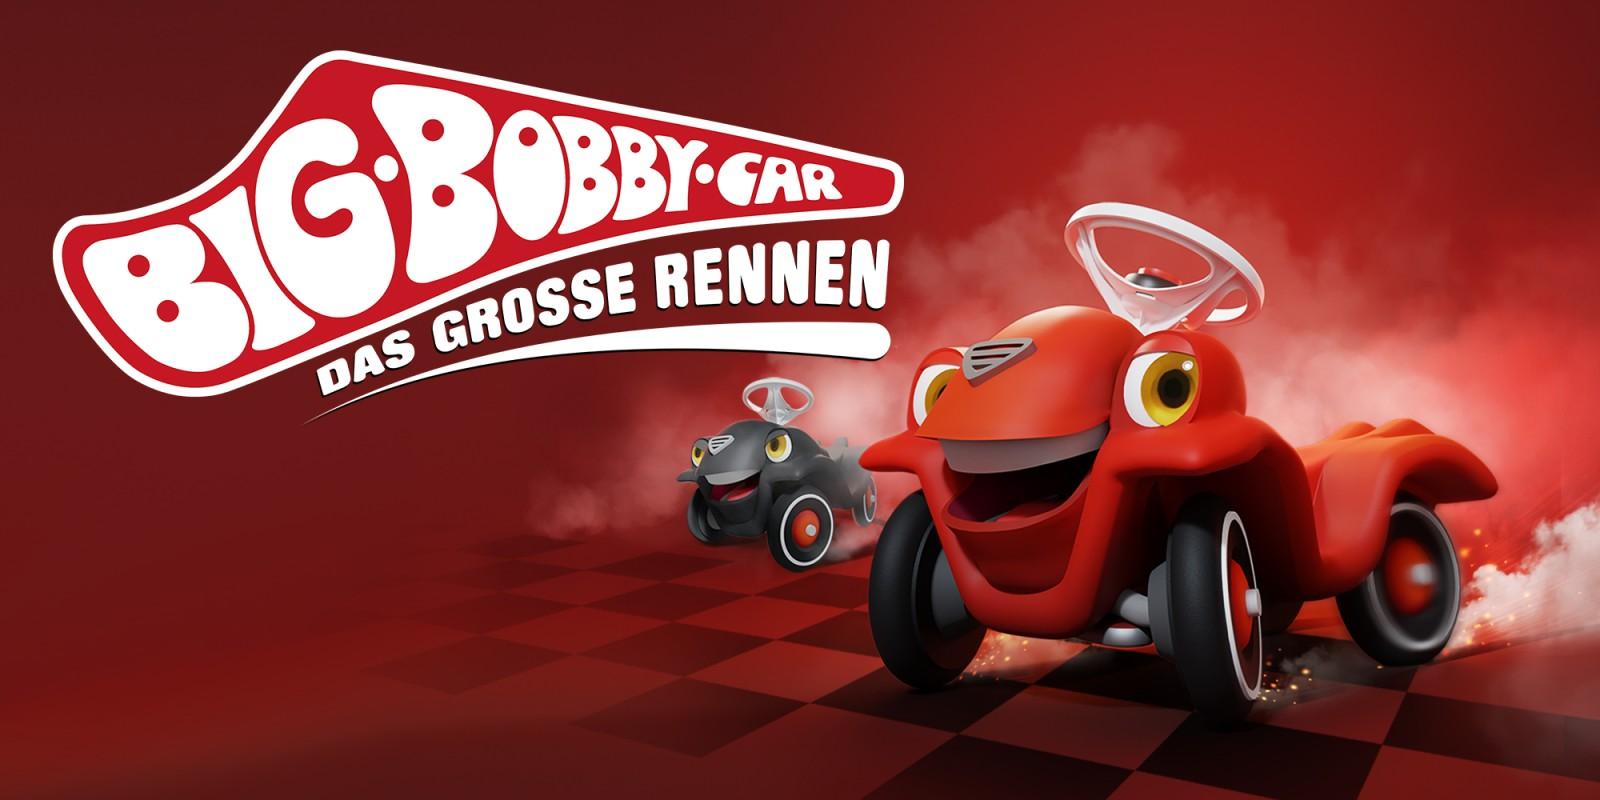 BIG-Bobby-Car - Das Grosse Rennen